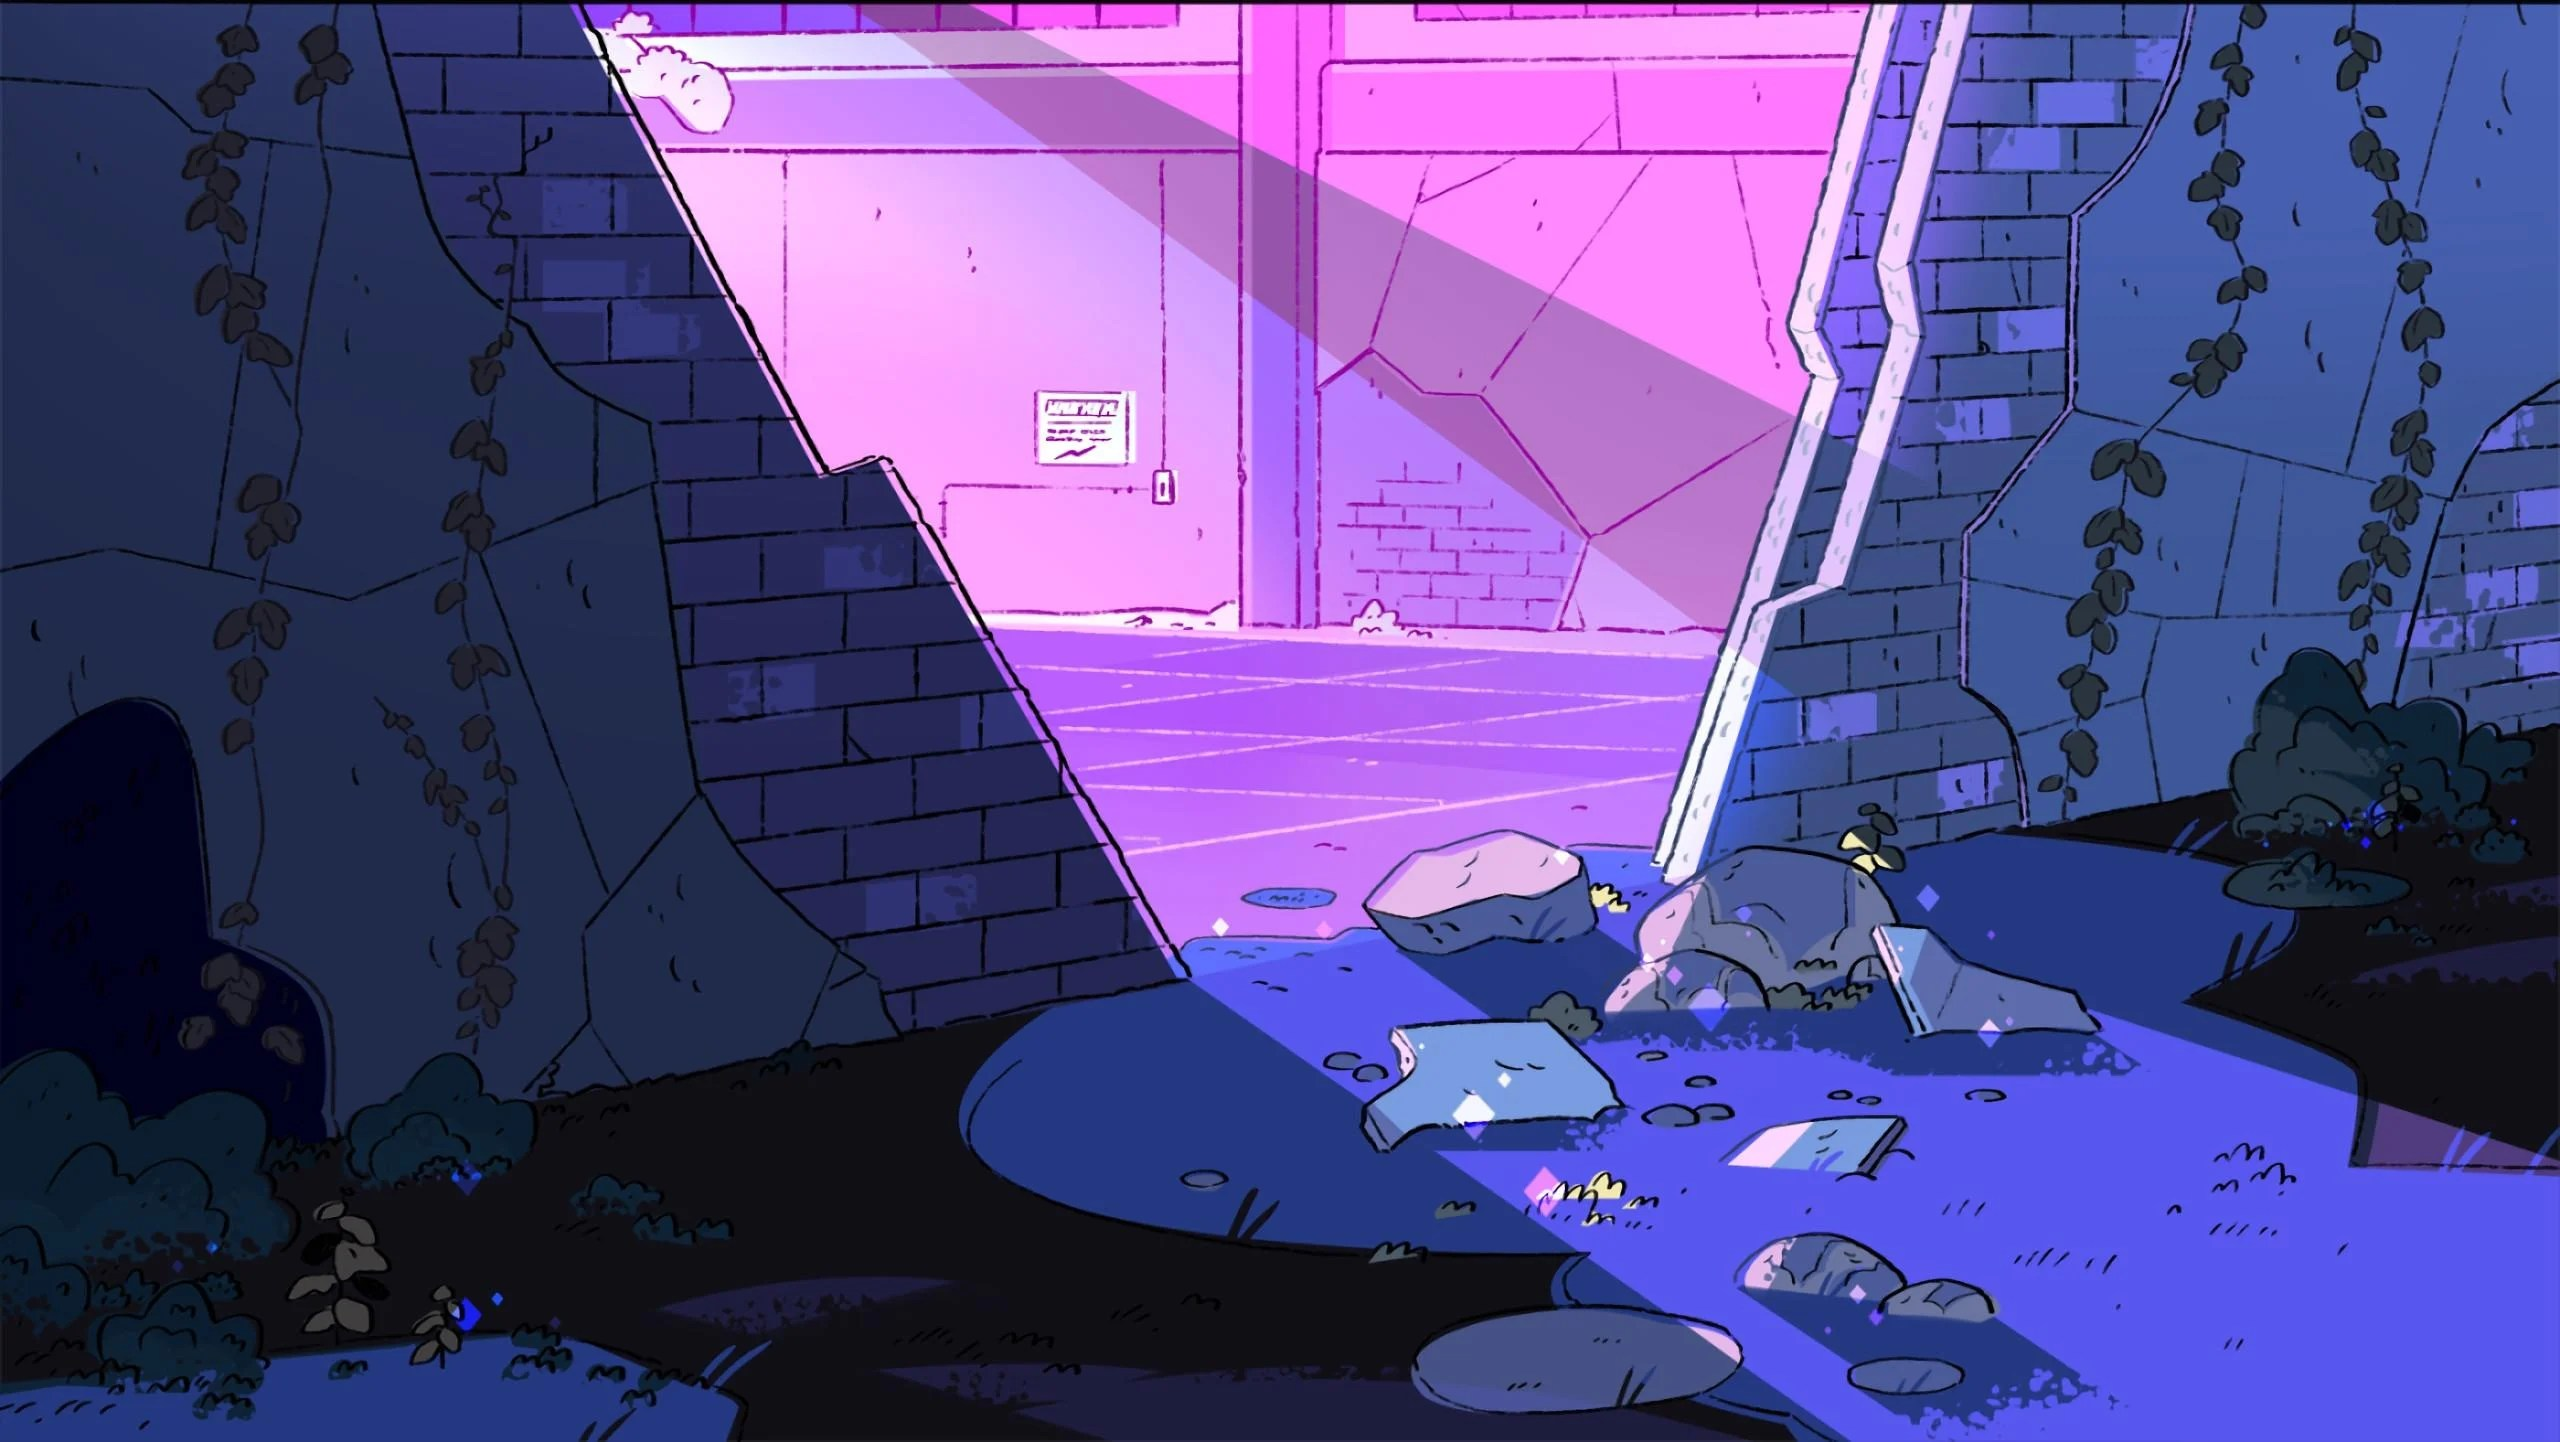 Get 90s anime aesthetic wallpaper laptop 4k background. 90s Anime Aesthetic Laptop Wallpapers - Wallpaper Cave